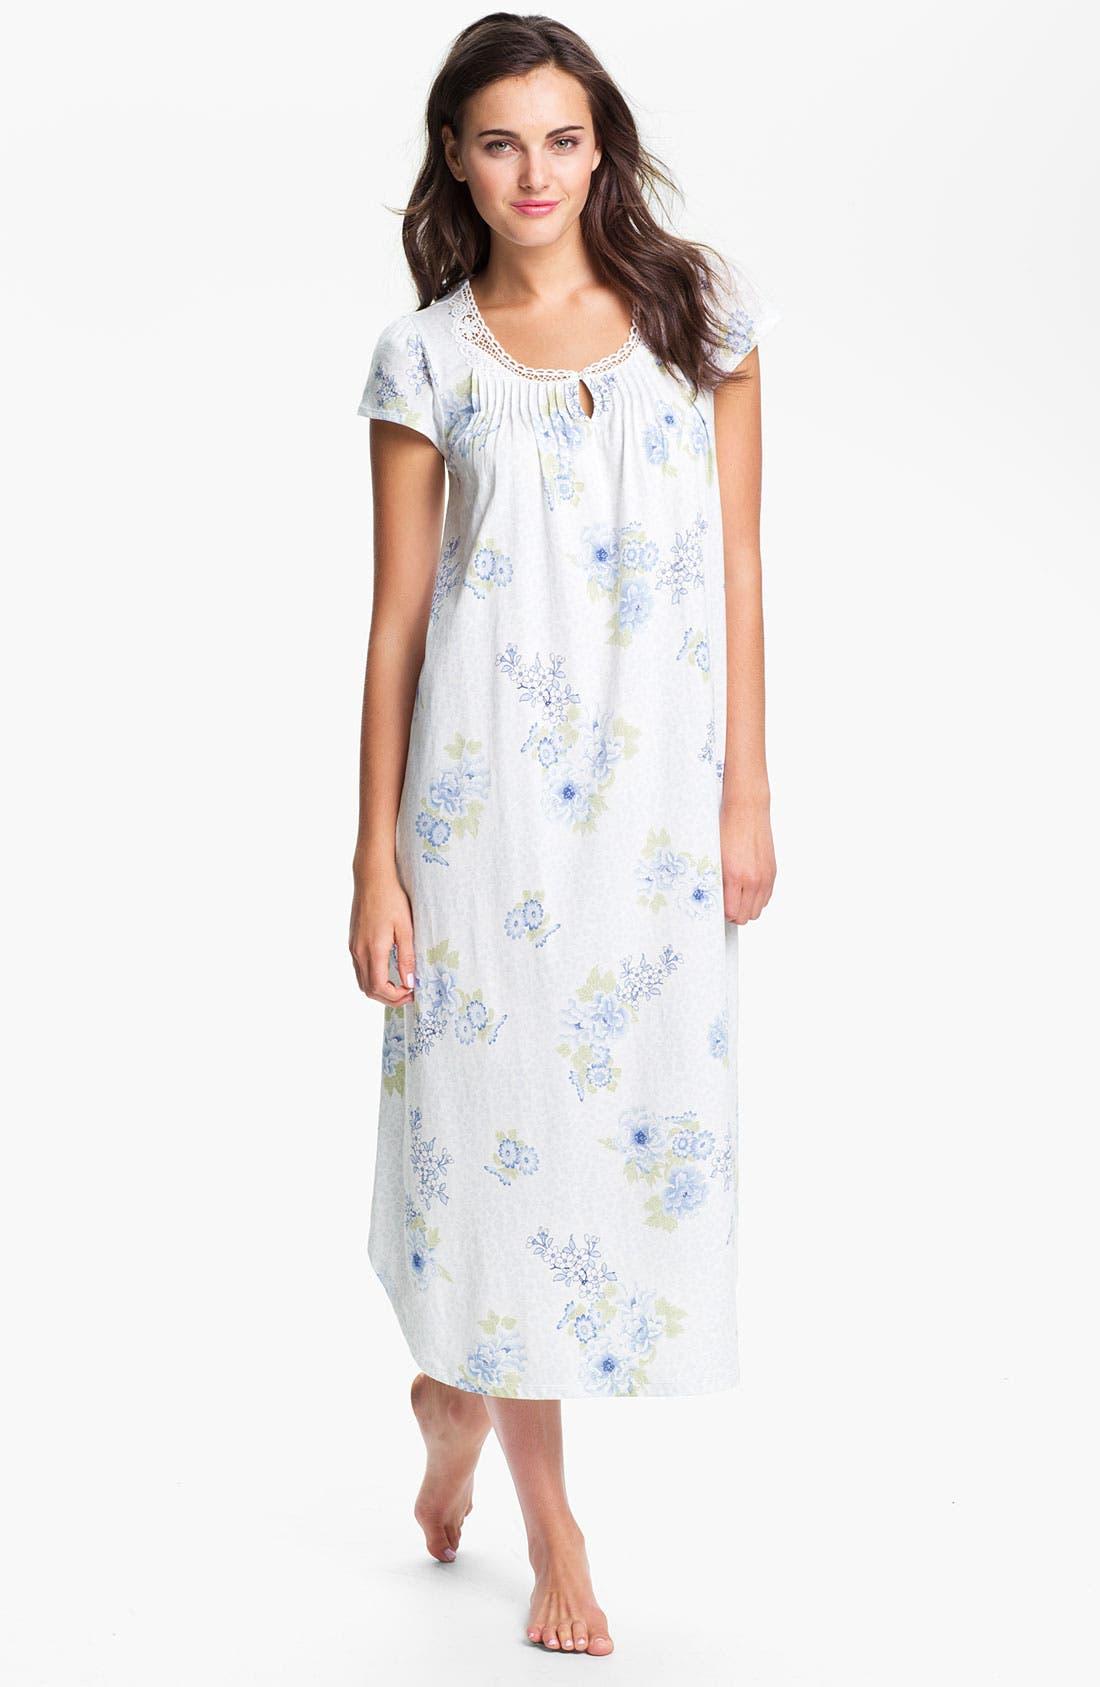 Alternate Image 1 Selected - Carole Hochman Designs Cotton Jersey Nightgown